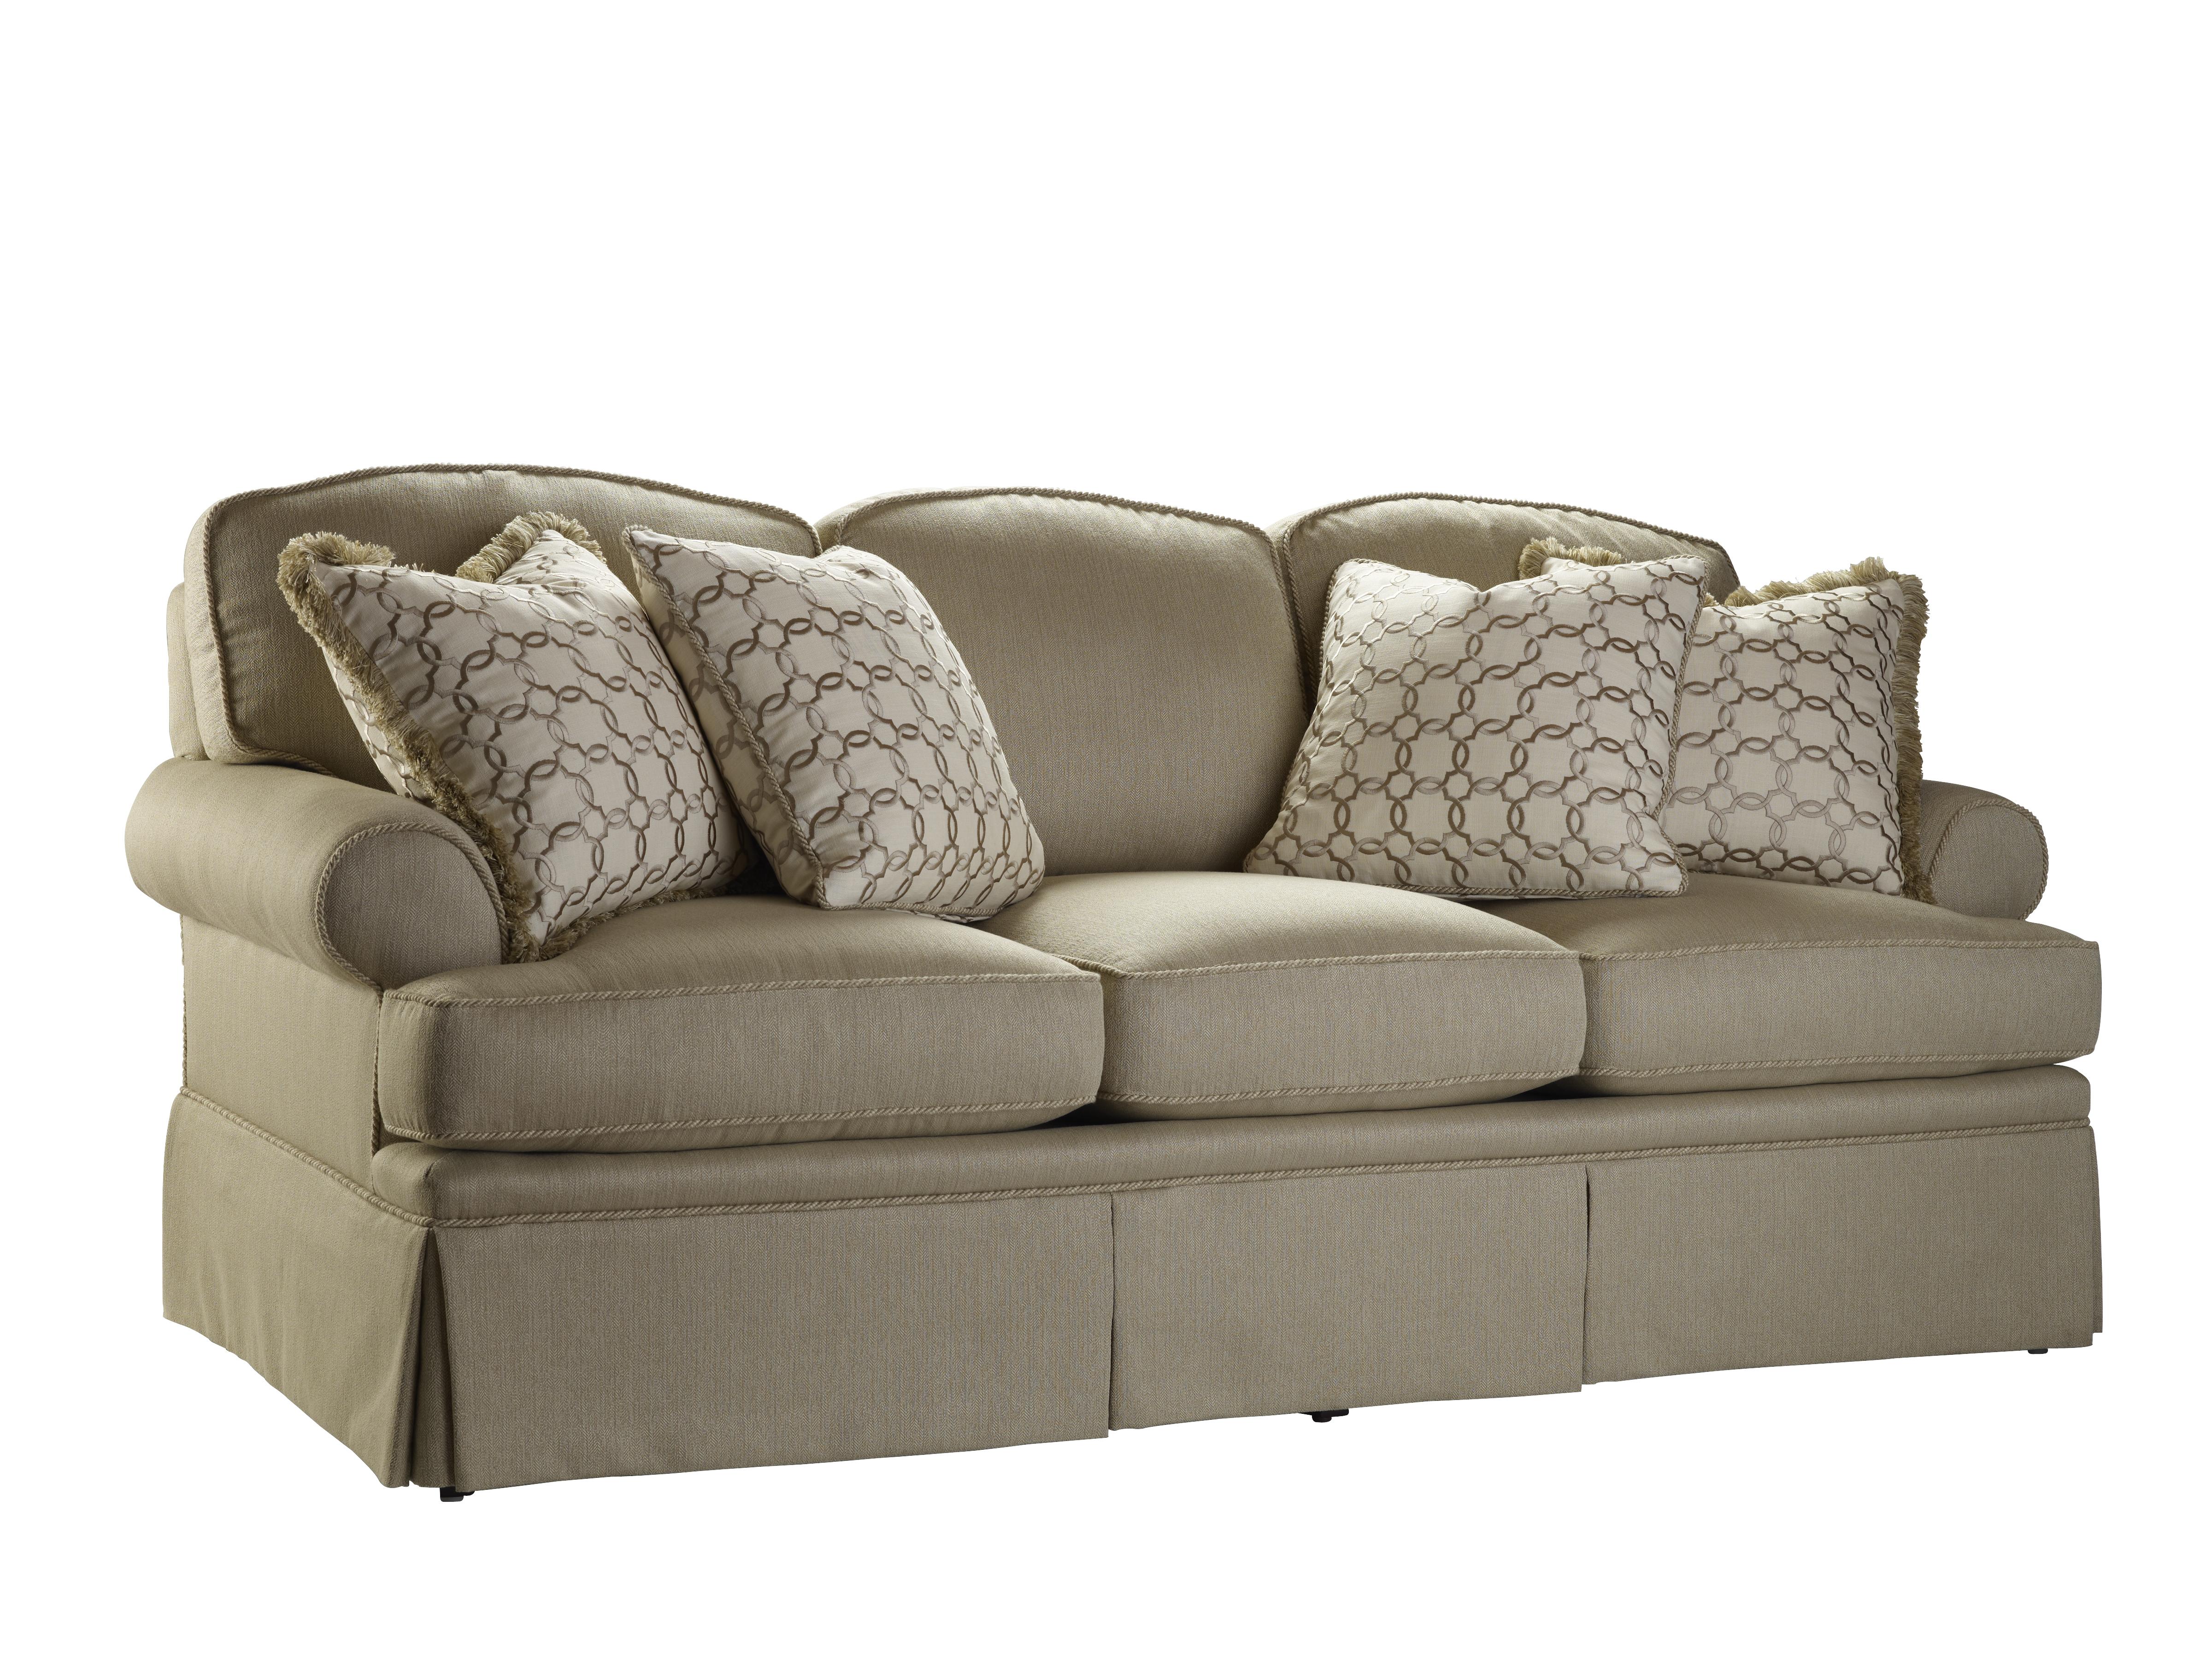 Highland House Furniture 2566 86 Emily Sofa